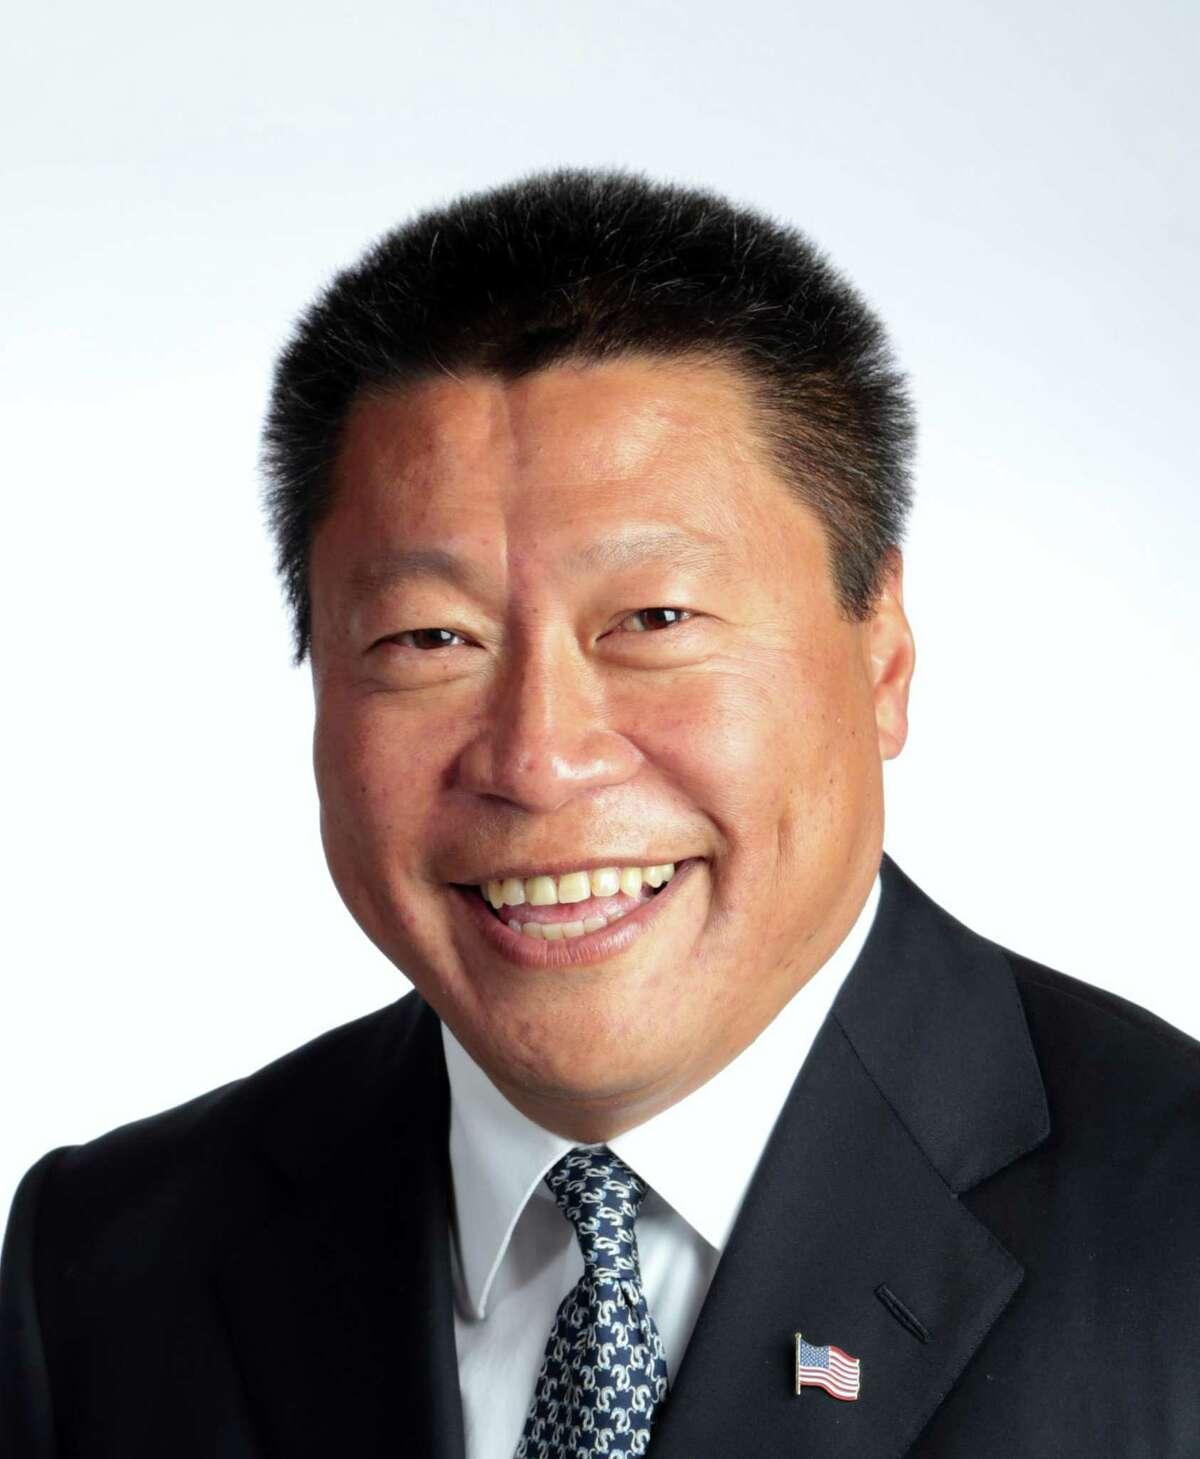 State Senator Tony Hwang (R-28)